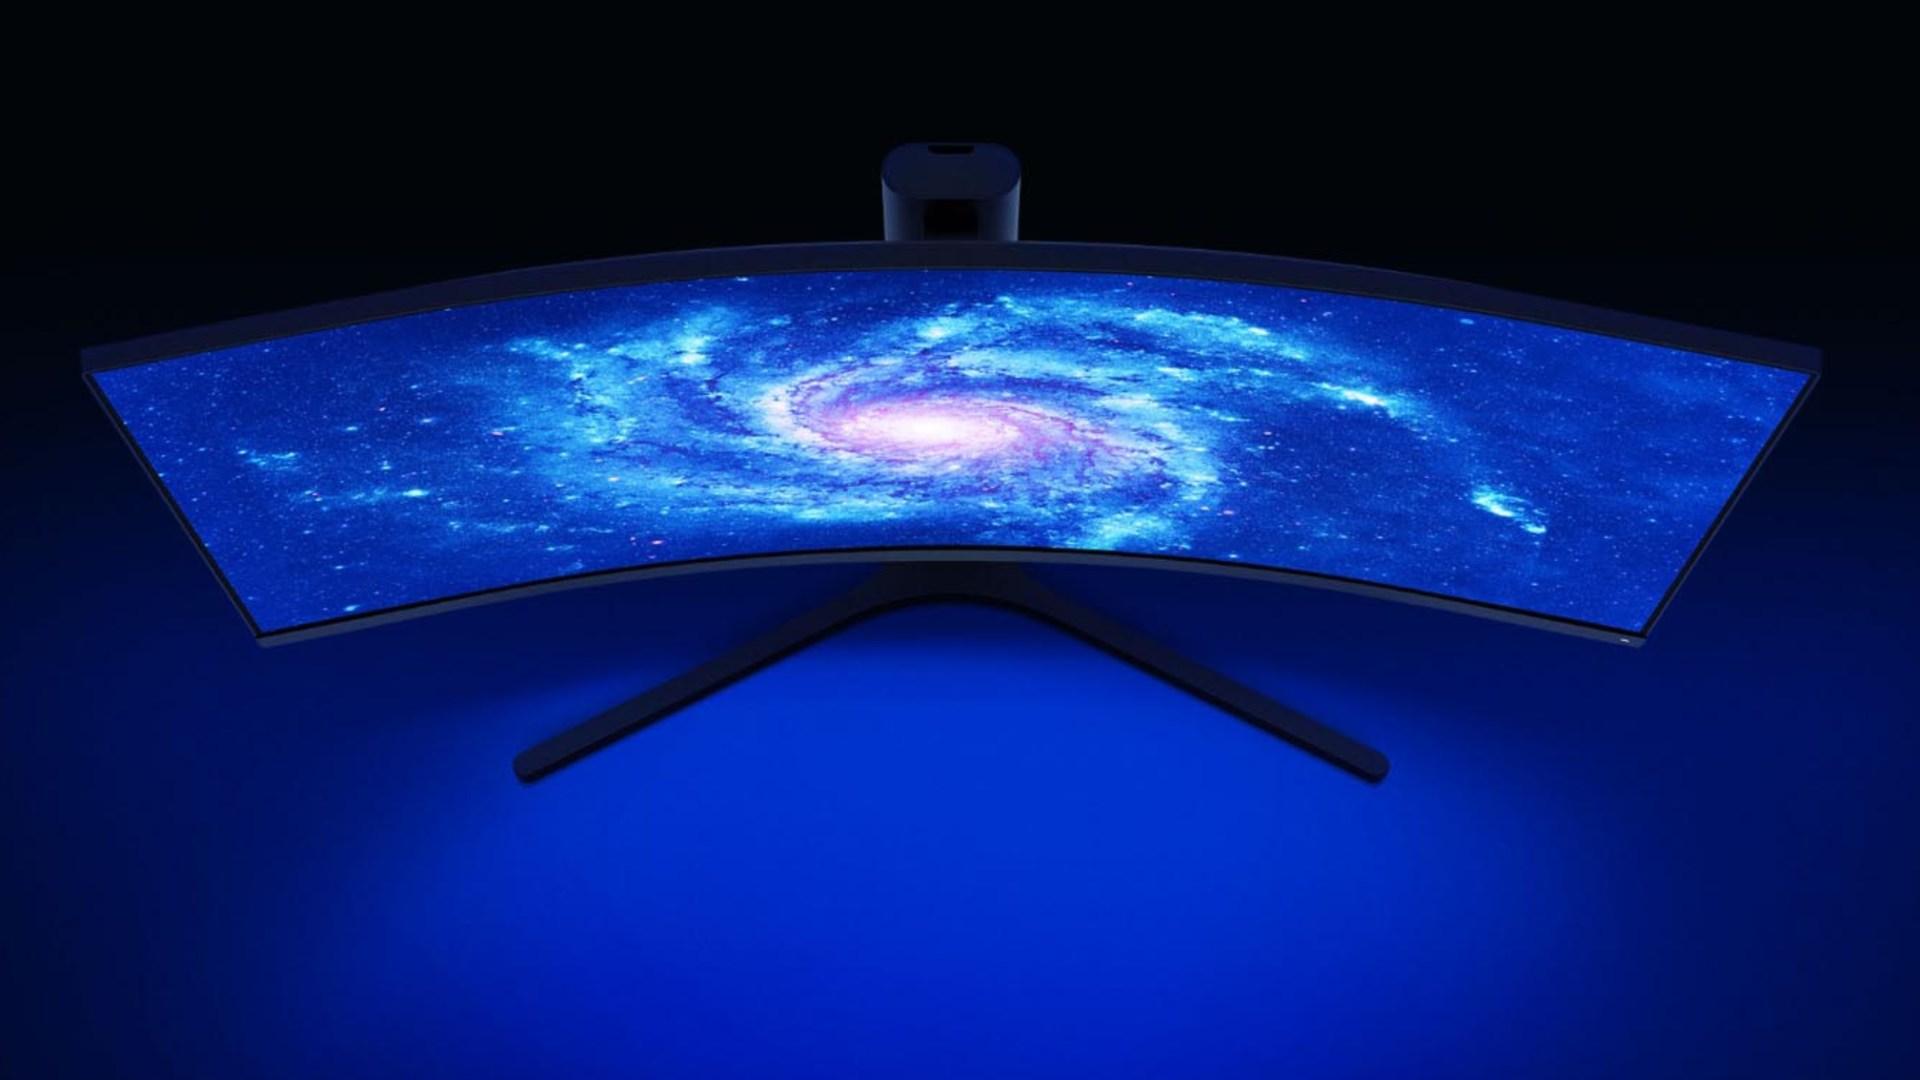 Gaming, Spiele, Display, Xiaomi, Bildschirm, Monitor, LCD, curved, Freesync, 144 Hertz, Xiaomi Mi Curved Gaming Monitor, 1500R